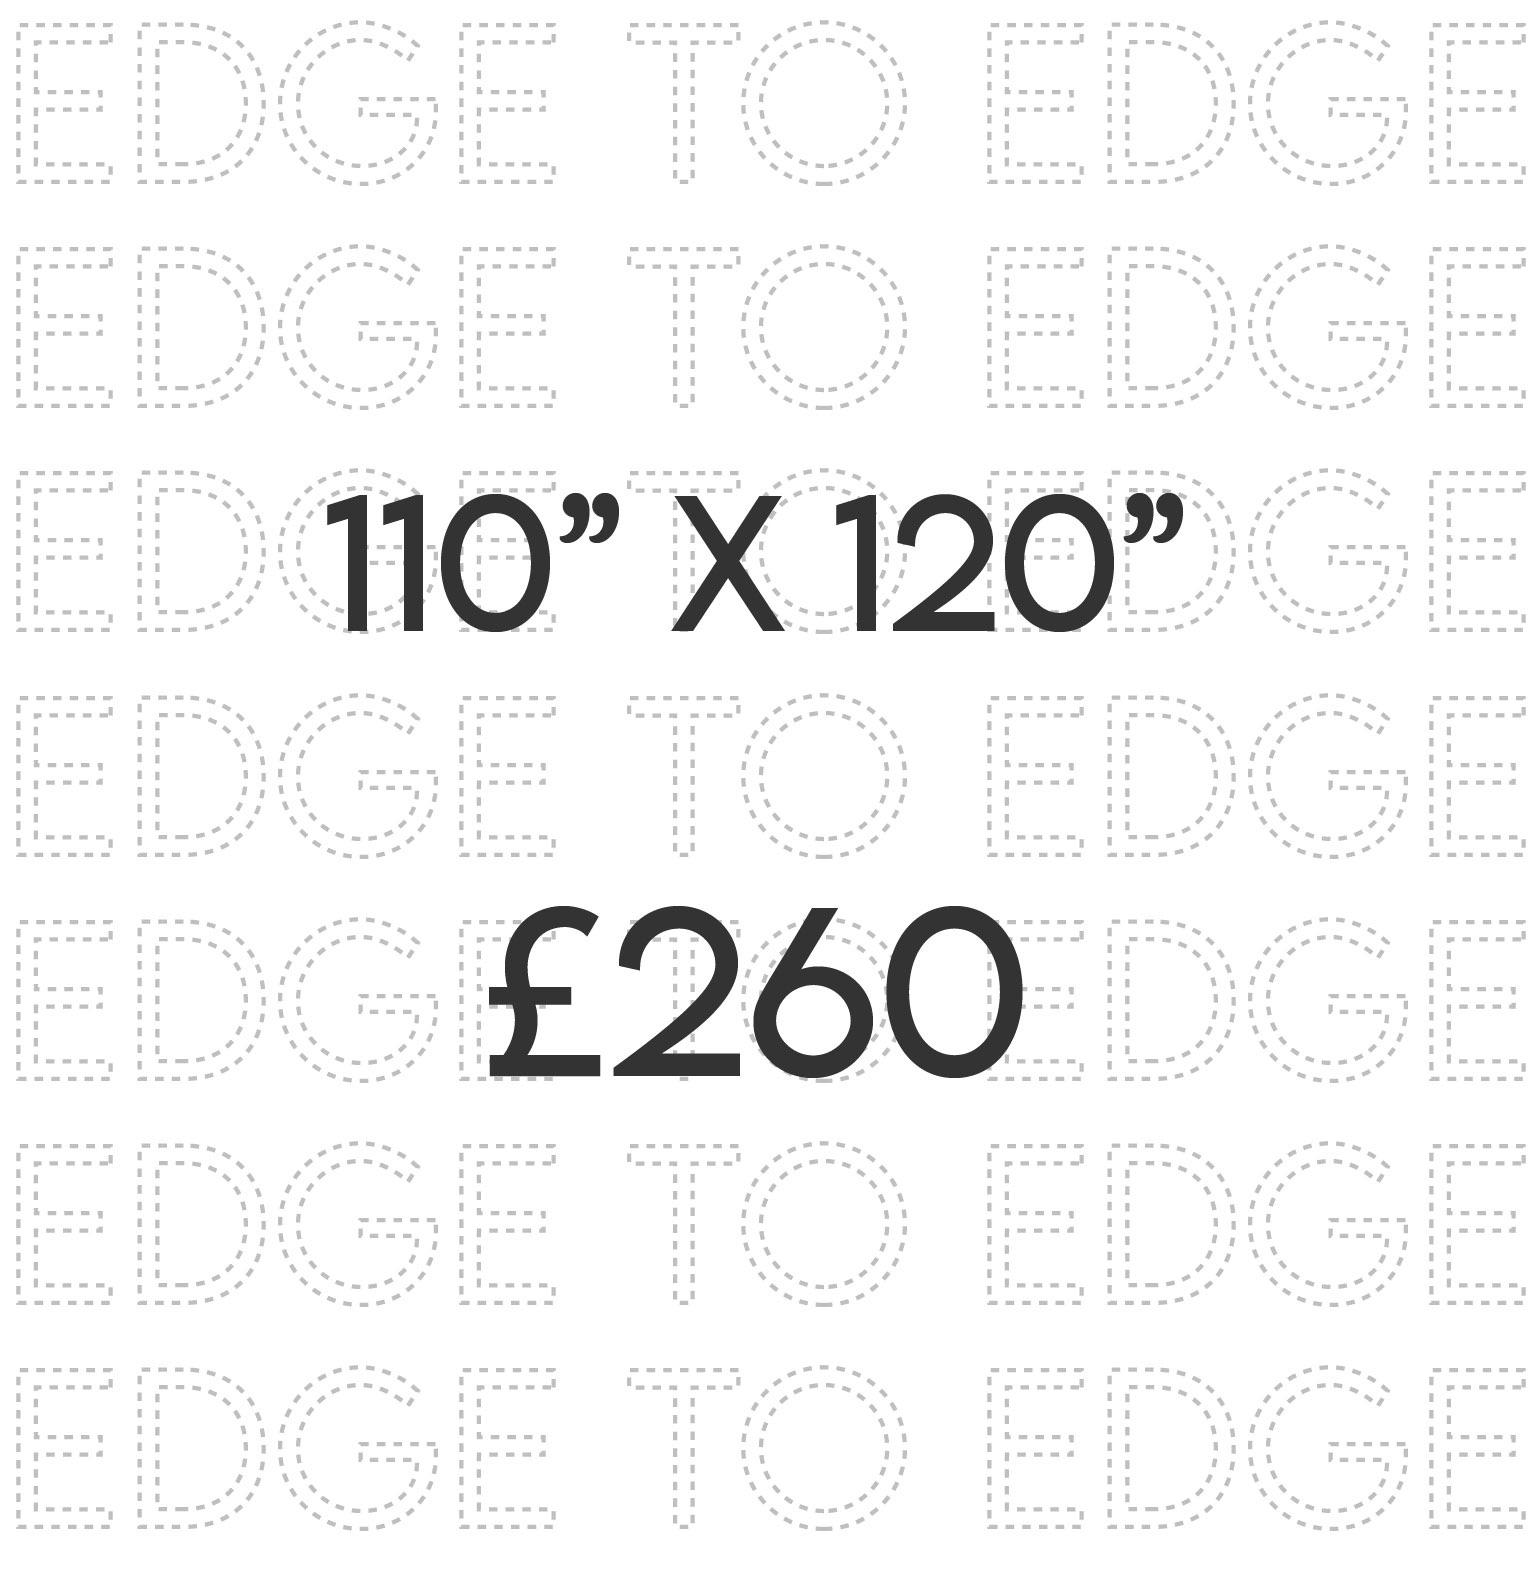 110 x 120